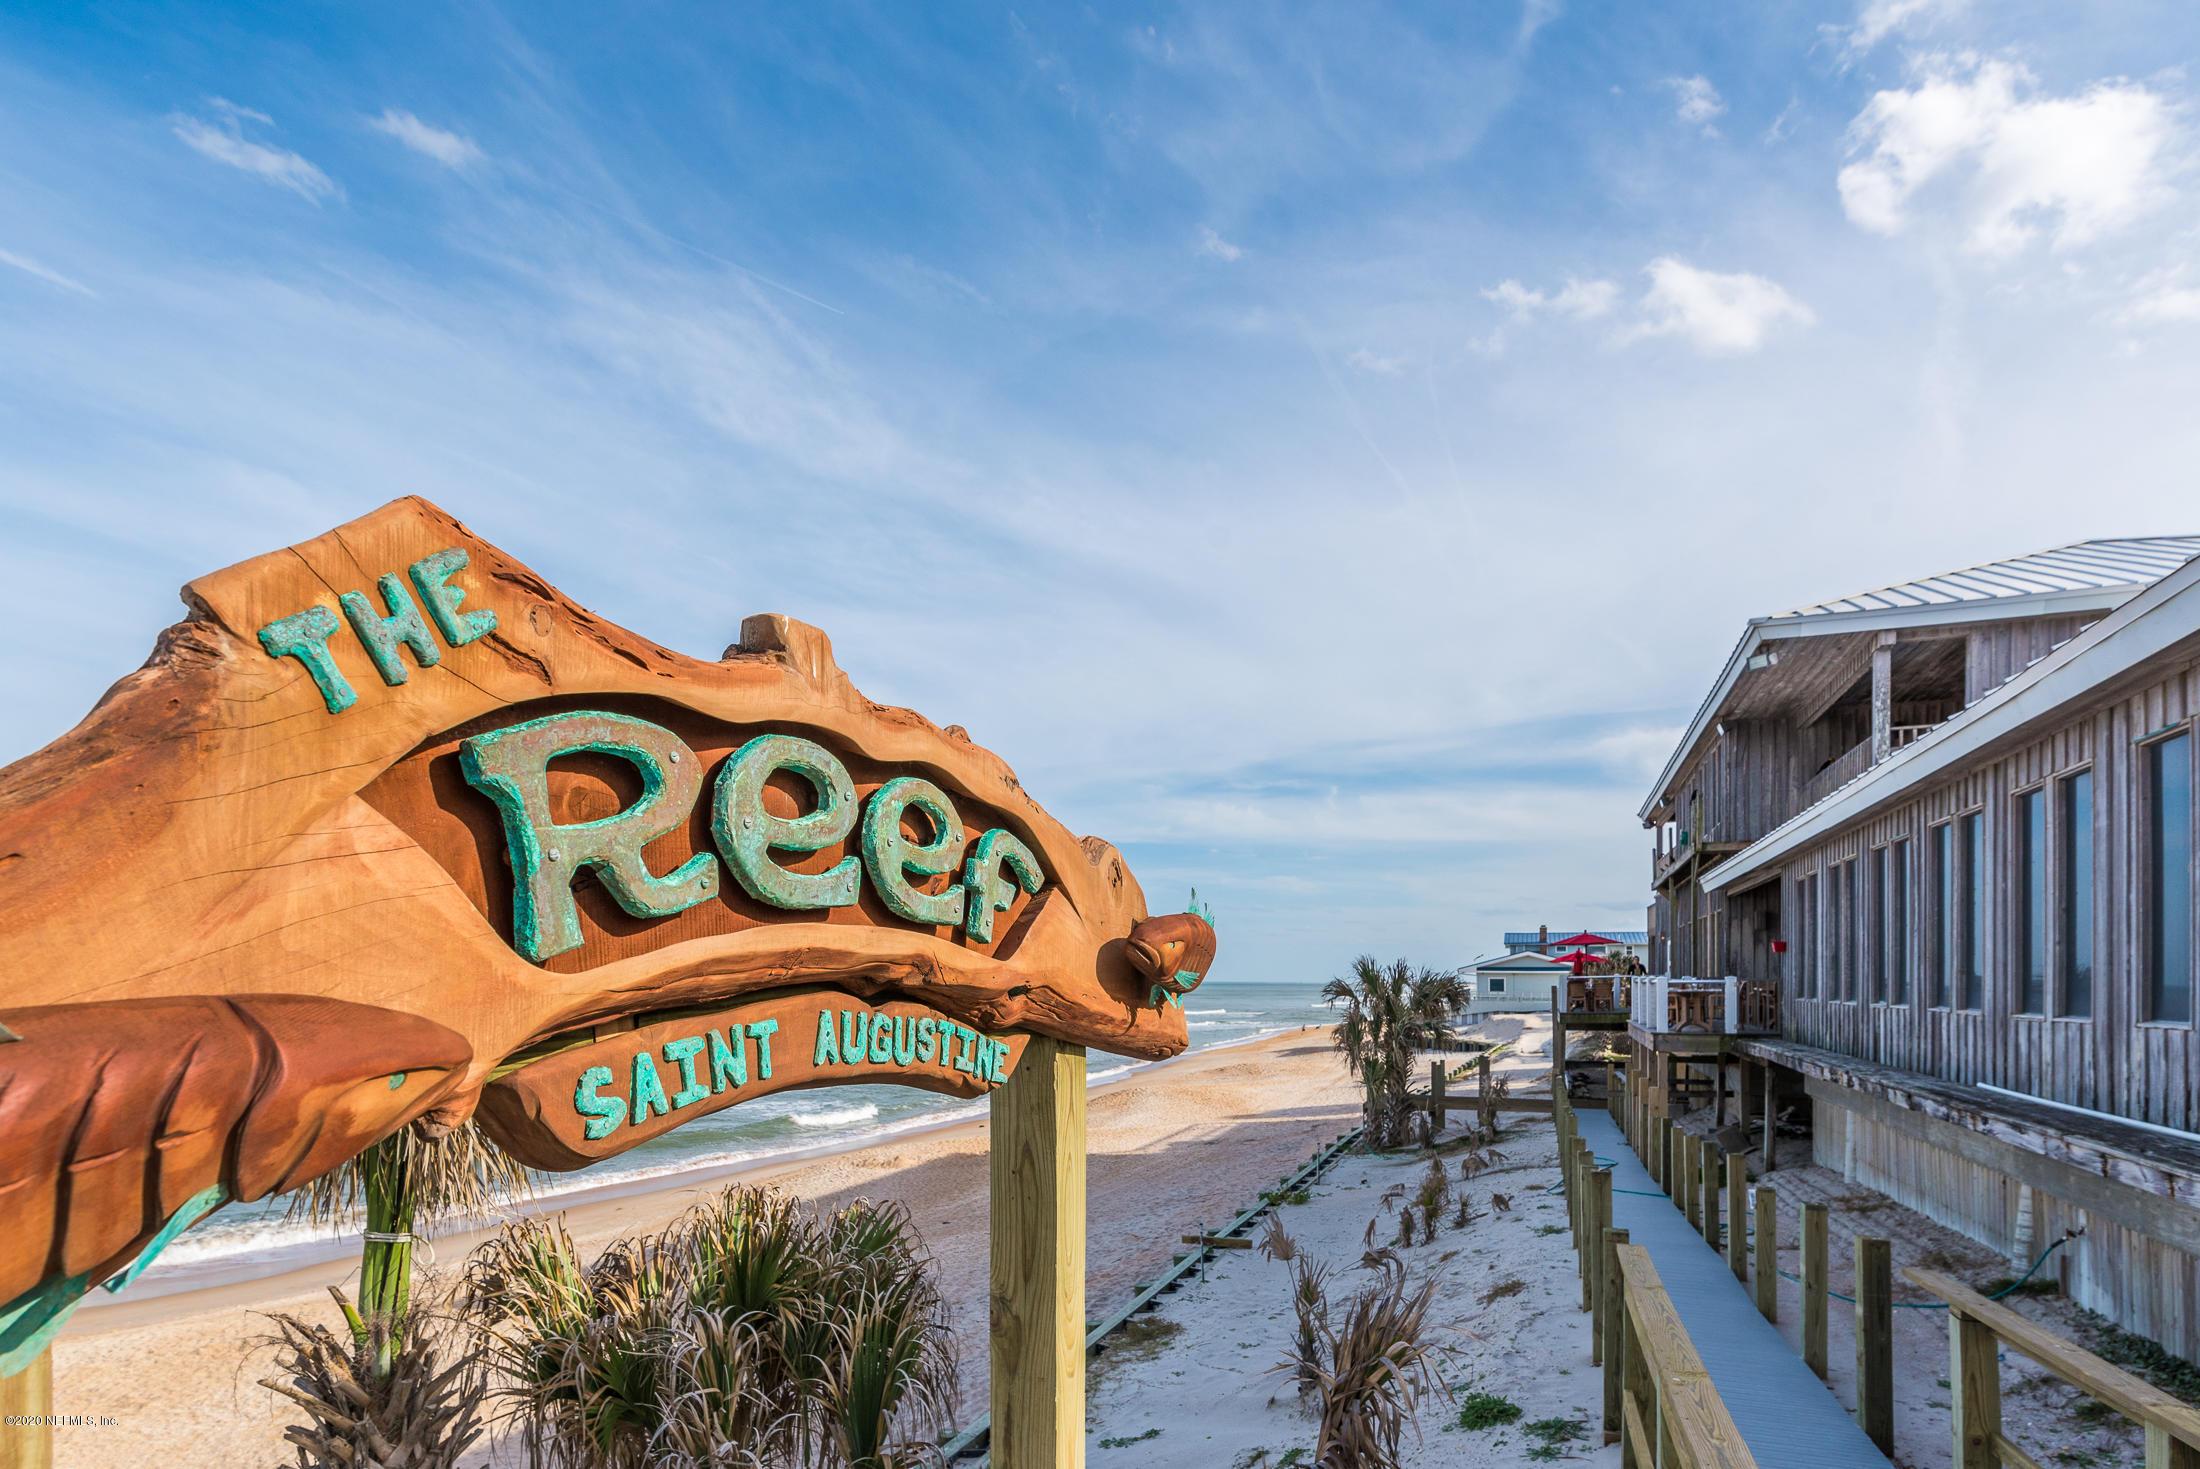 105 JEREZ, ST AUGUSTINE, FLORIDA 32084, 3 Bedrooms Bedrooms, ,2 BathroomsBathrooms,Residential,For sale,JEREZ,1042064